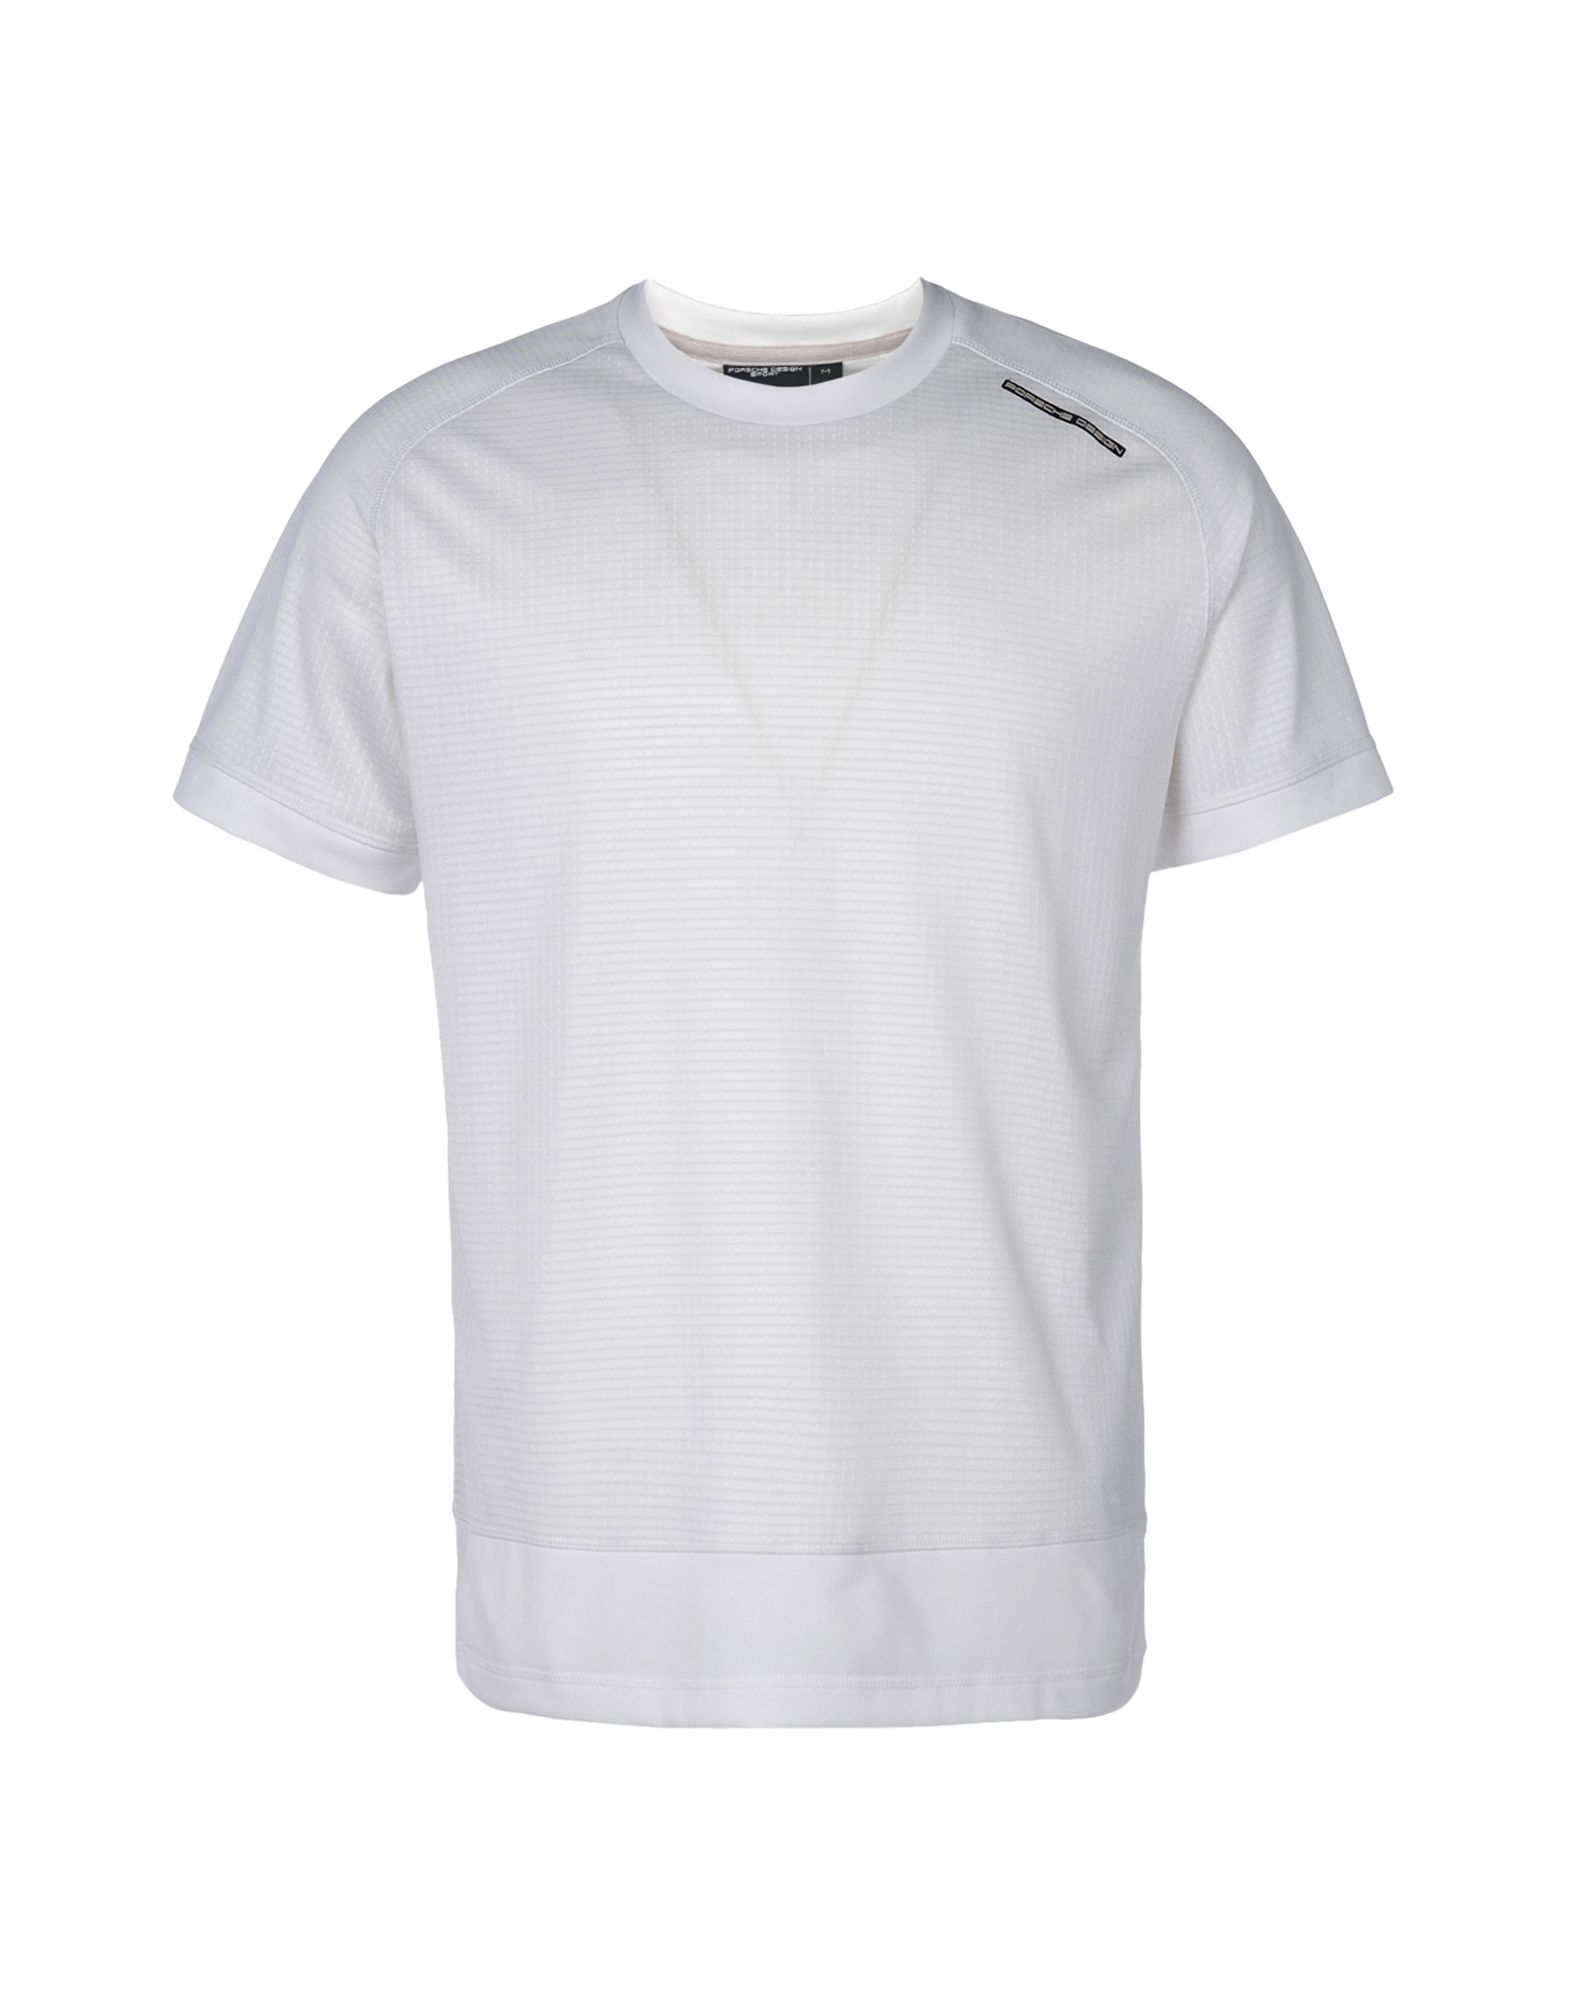 porsche design t shirt in white for men lyst. Black Bedroom Furniture Sets. Home Design Ideas